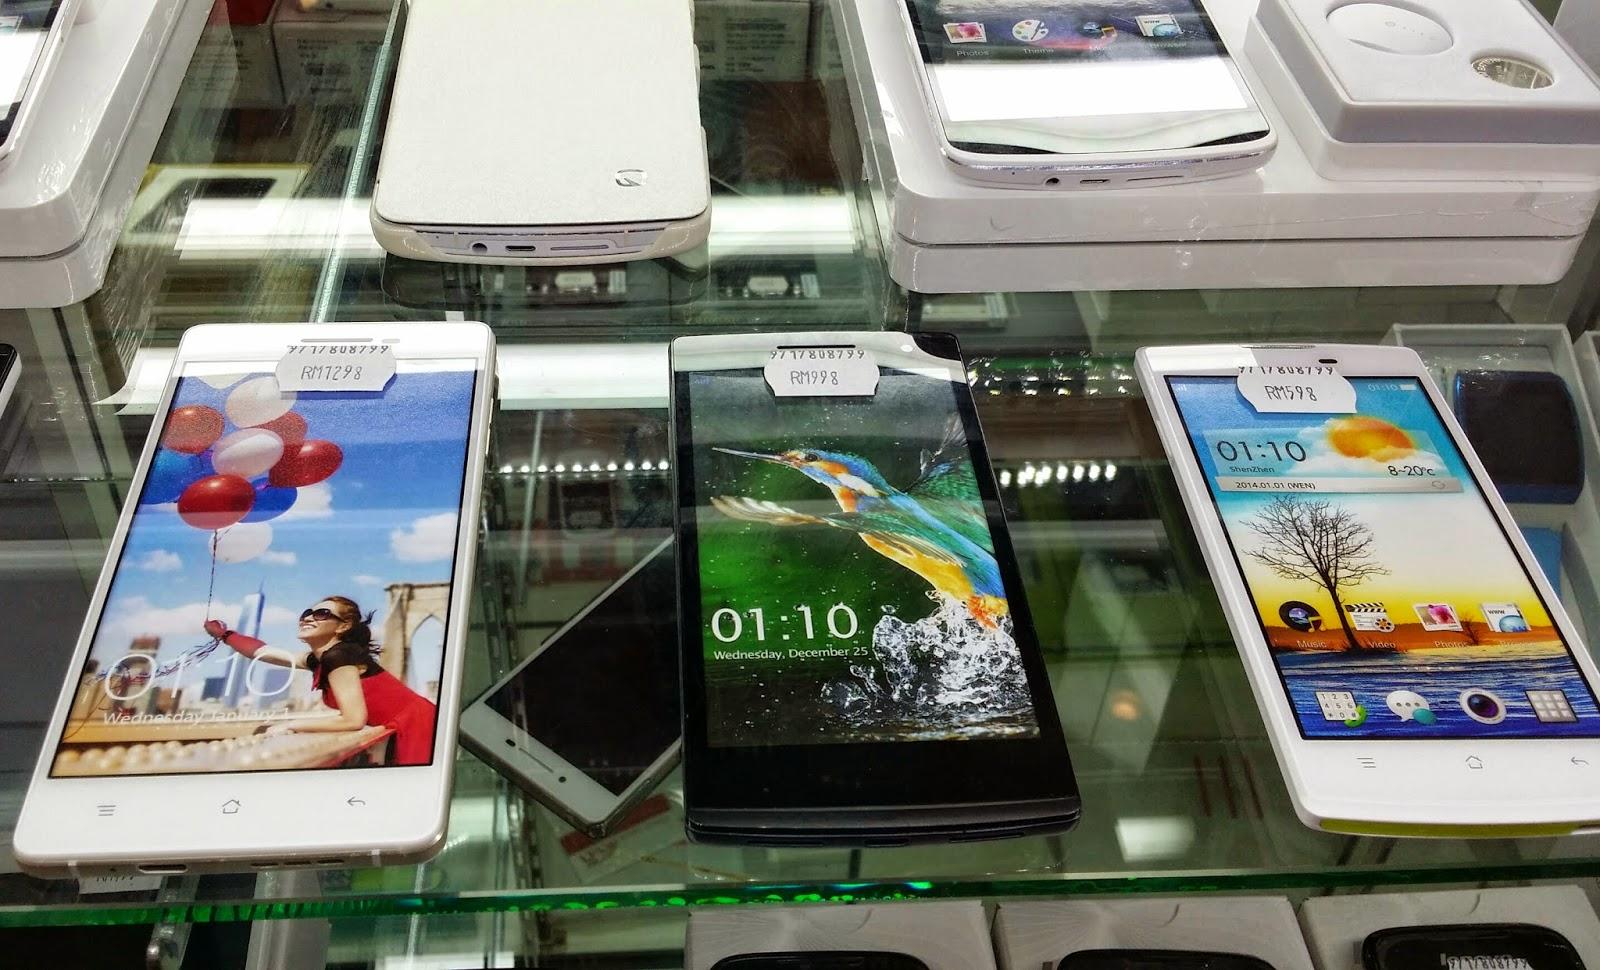 TABLET PHONE HKV, note 3, samsung note 3, smartphone lenovo, lenovo, oppo, telefon oppo, harga oppo, smartphone,